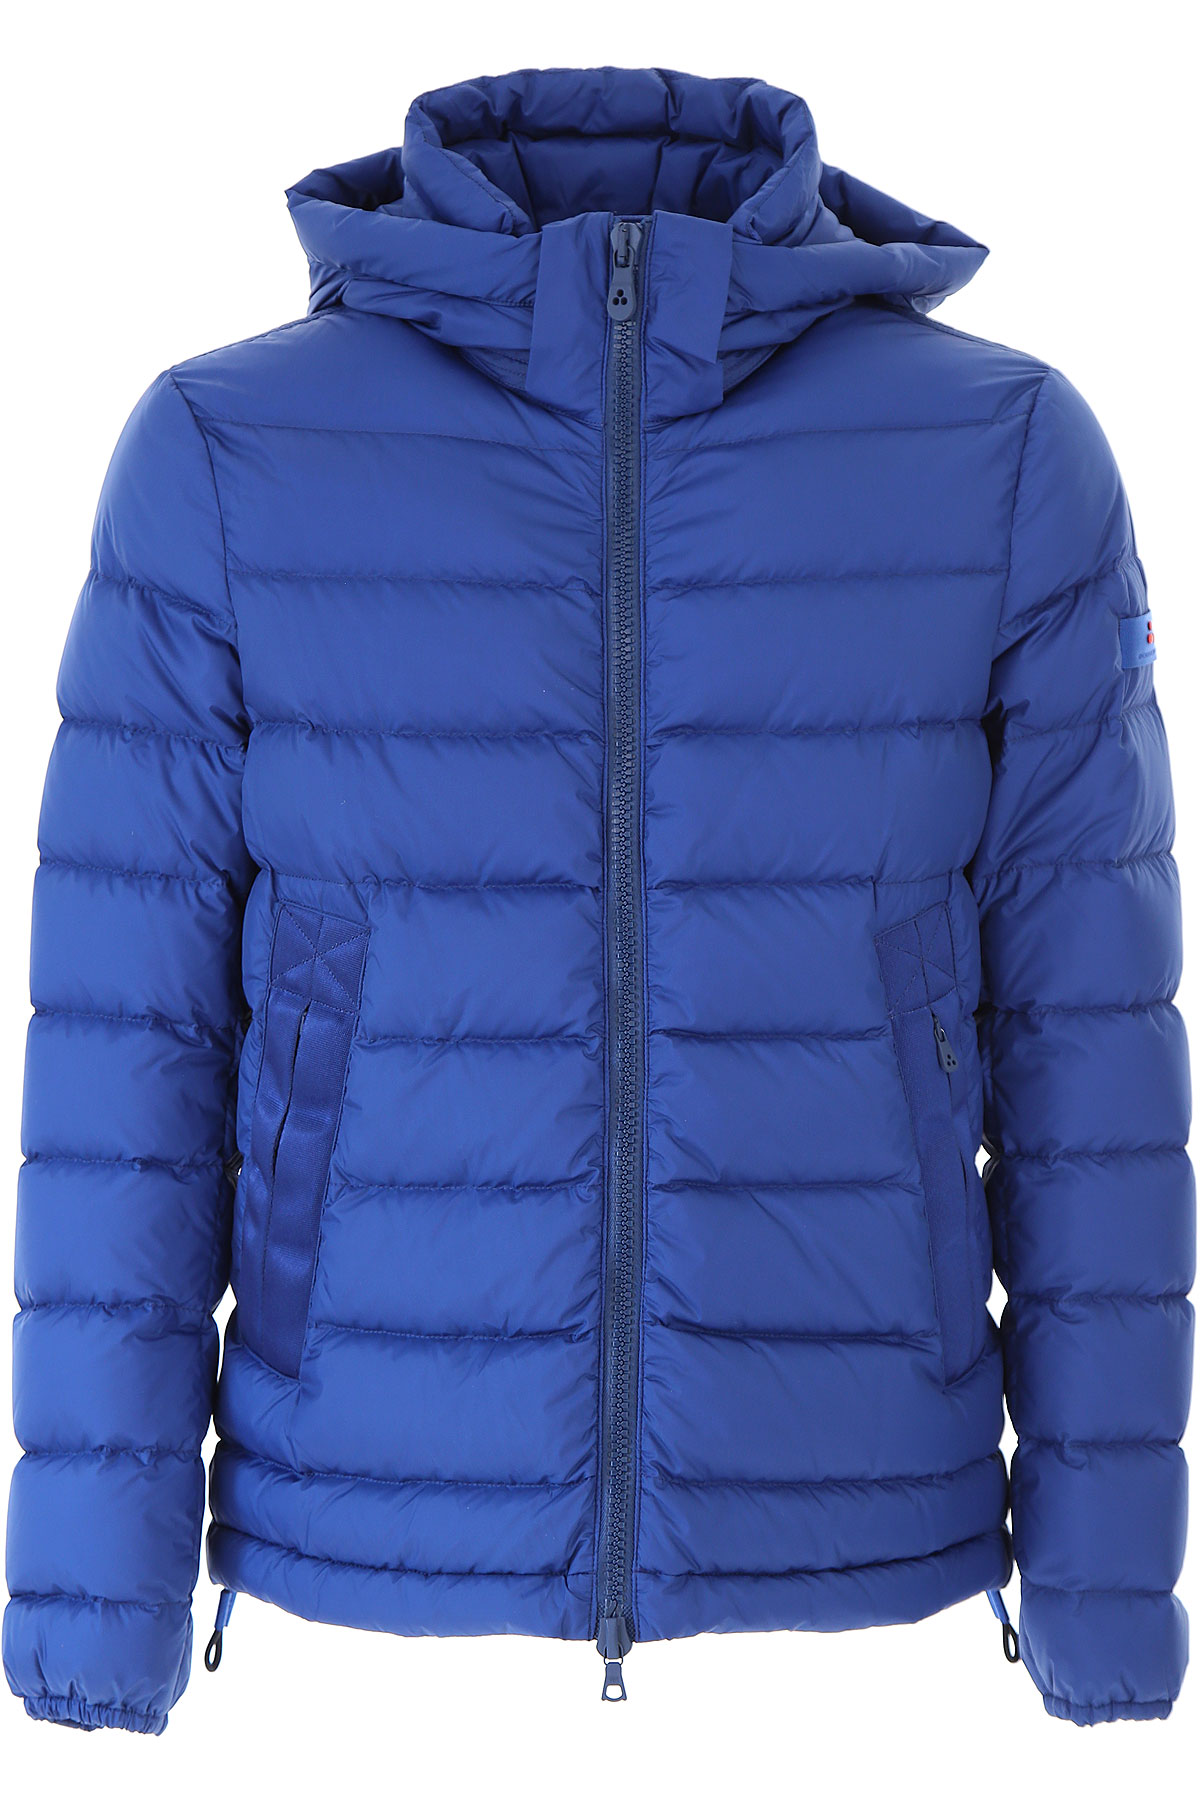 Image of Peuterey Down Jacket for Men, Puffer Ski Jacket, Blue Sea, polyamide, 2017, L S XL